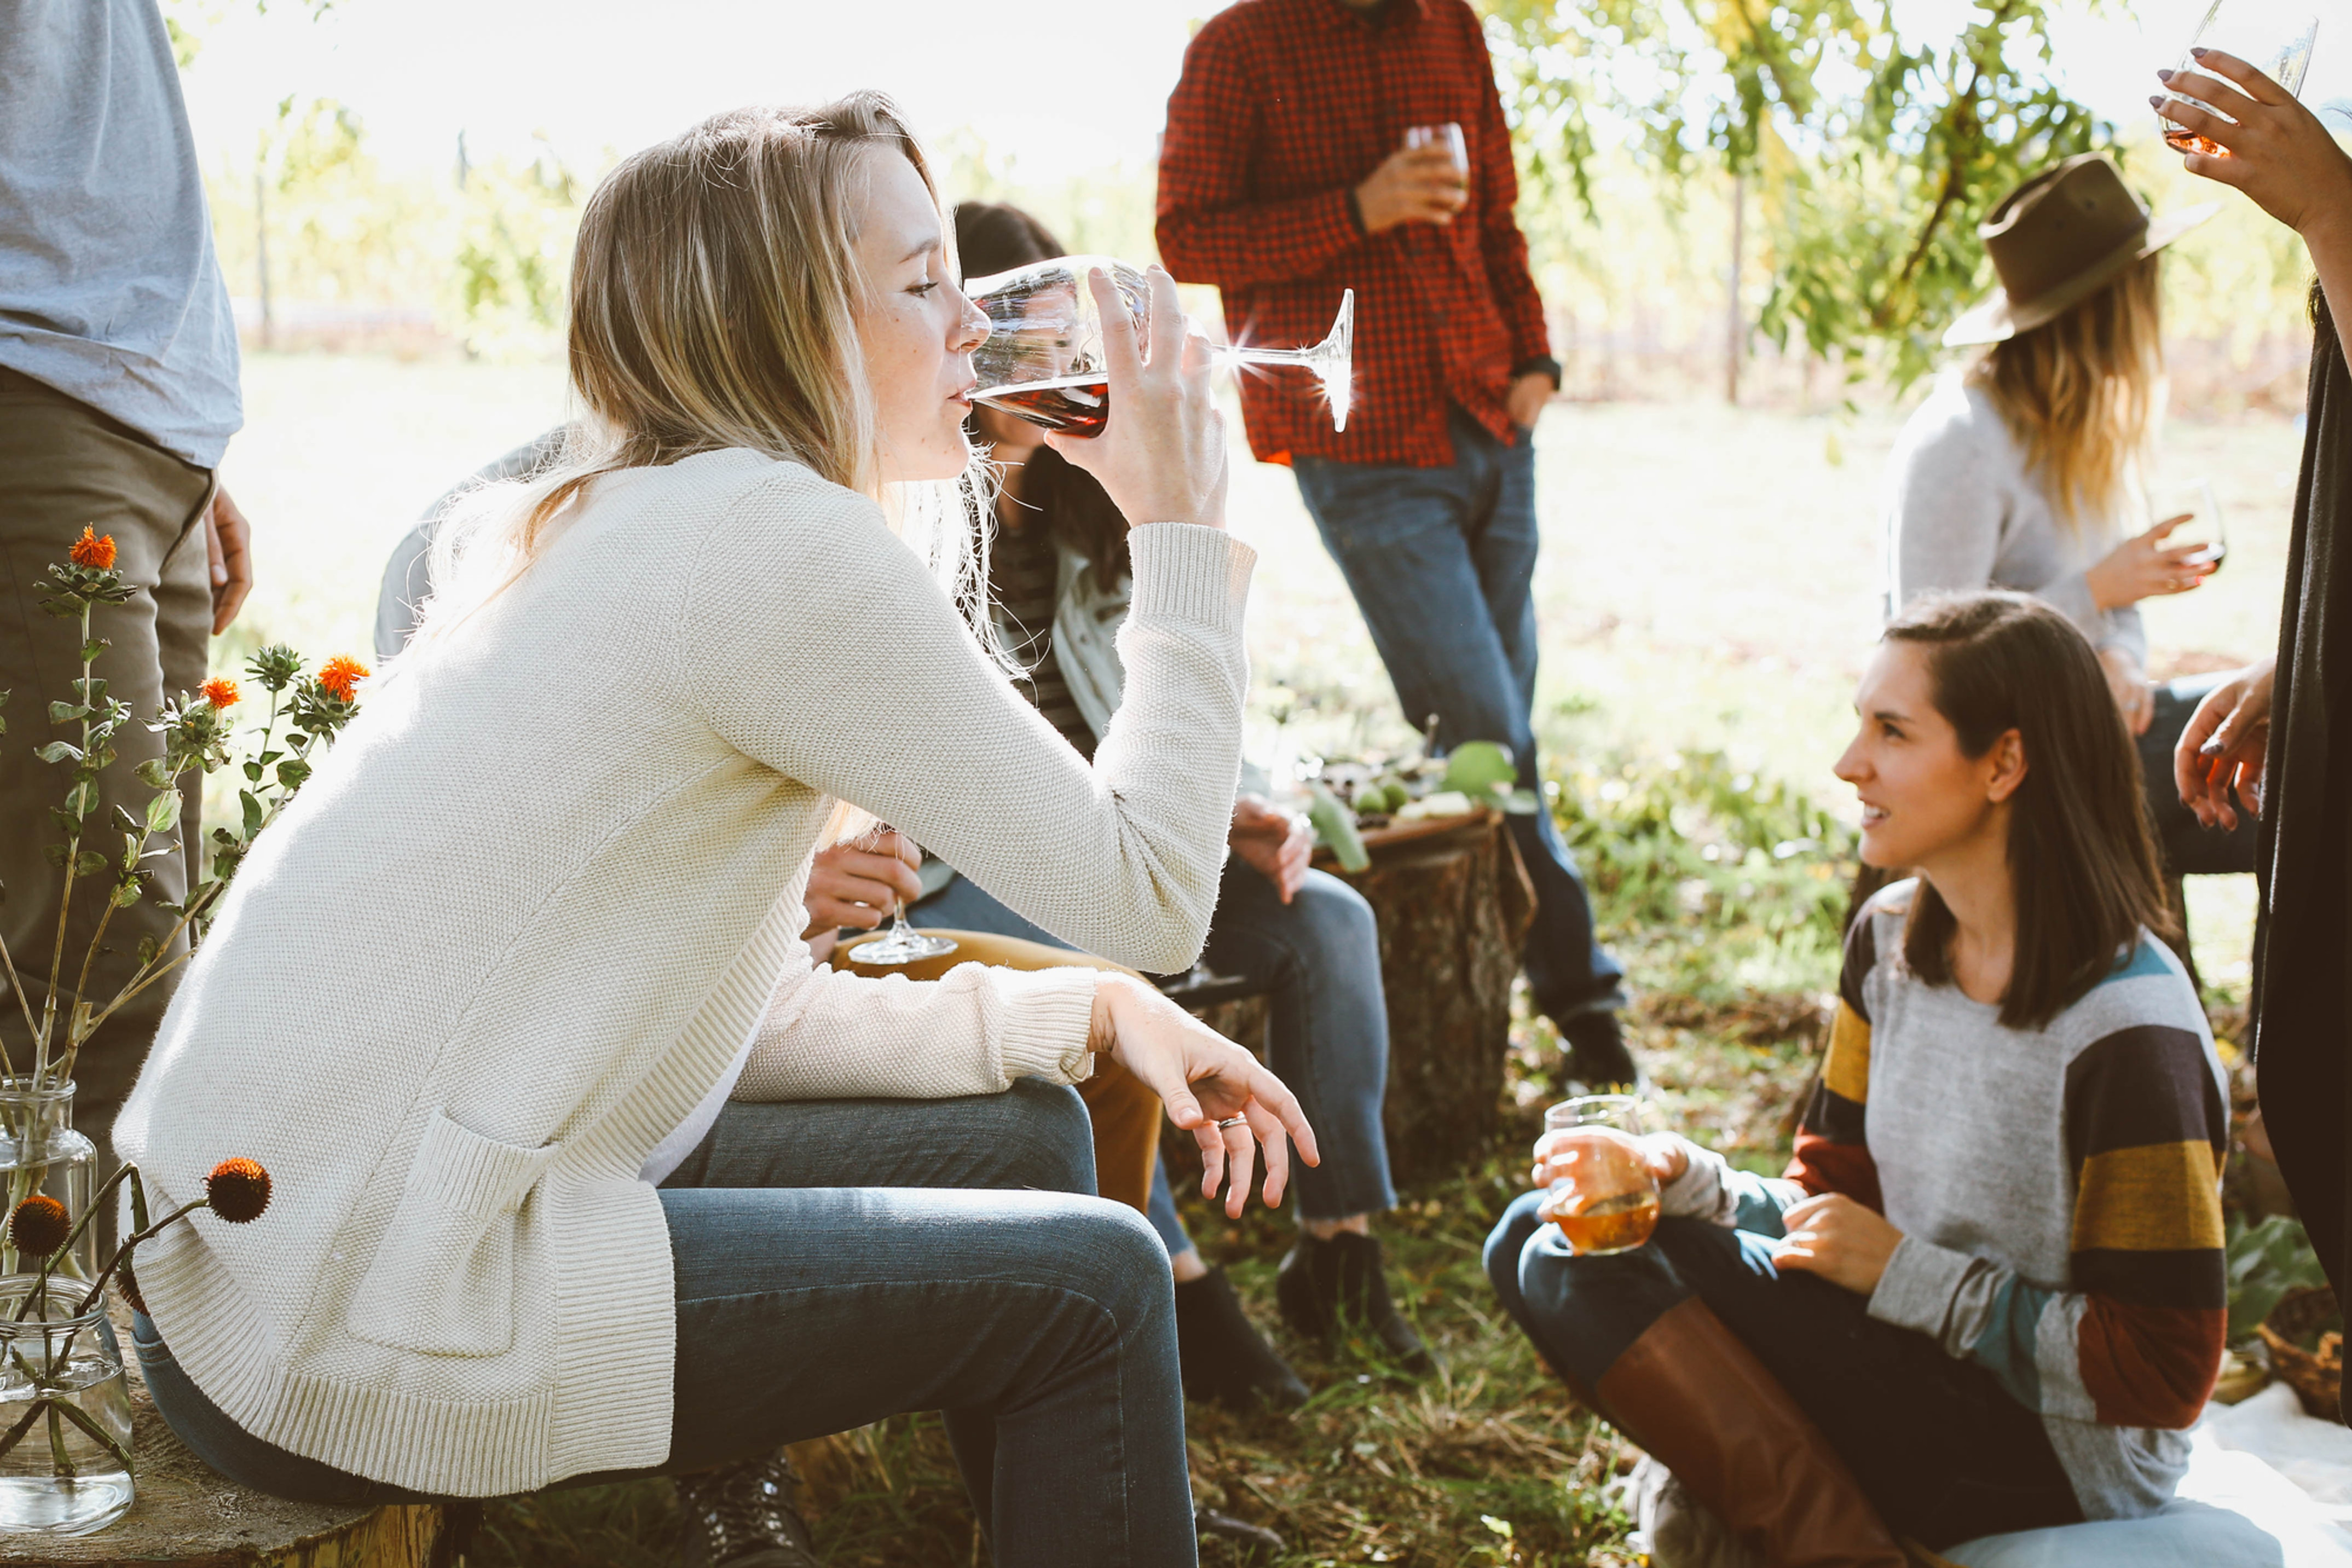 Custom Wine tasting with Friends